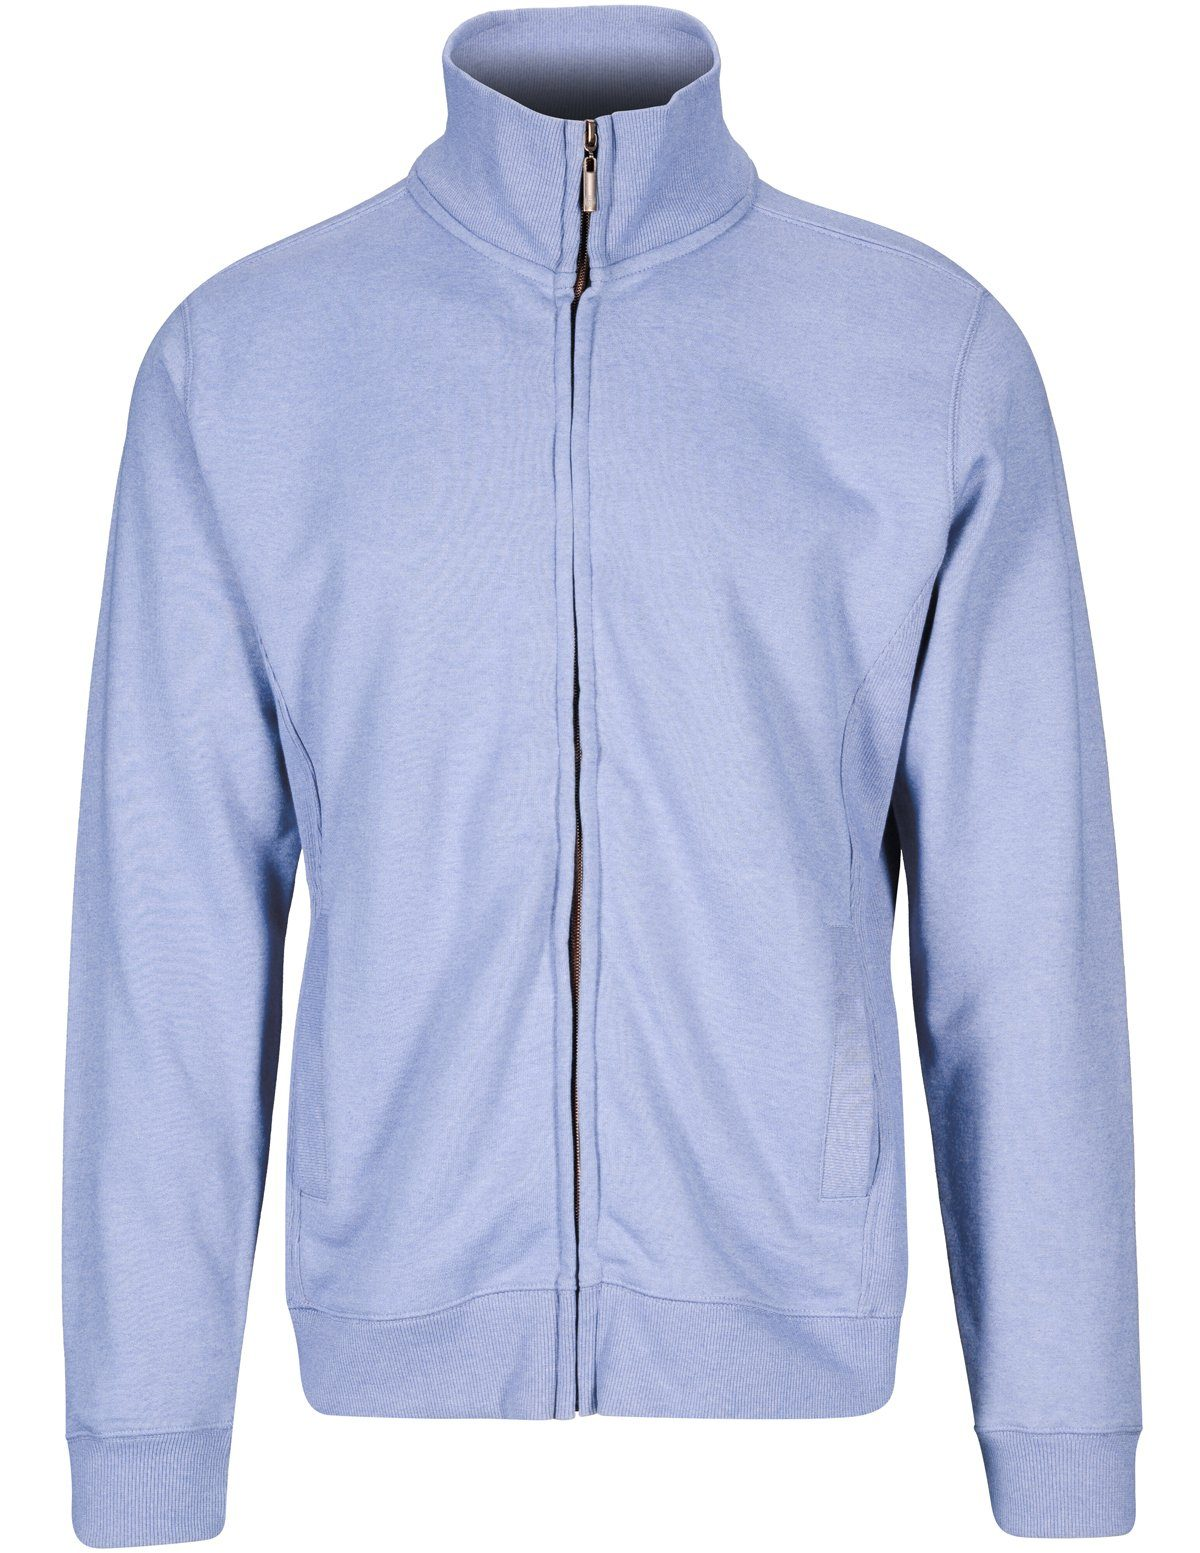 BASEFIELD Sweatshirt für Casual-Looks